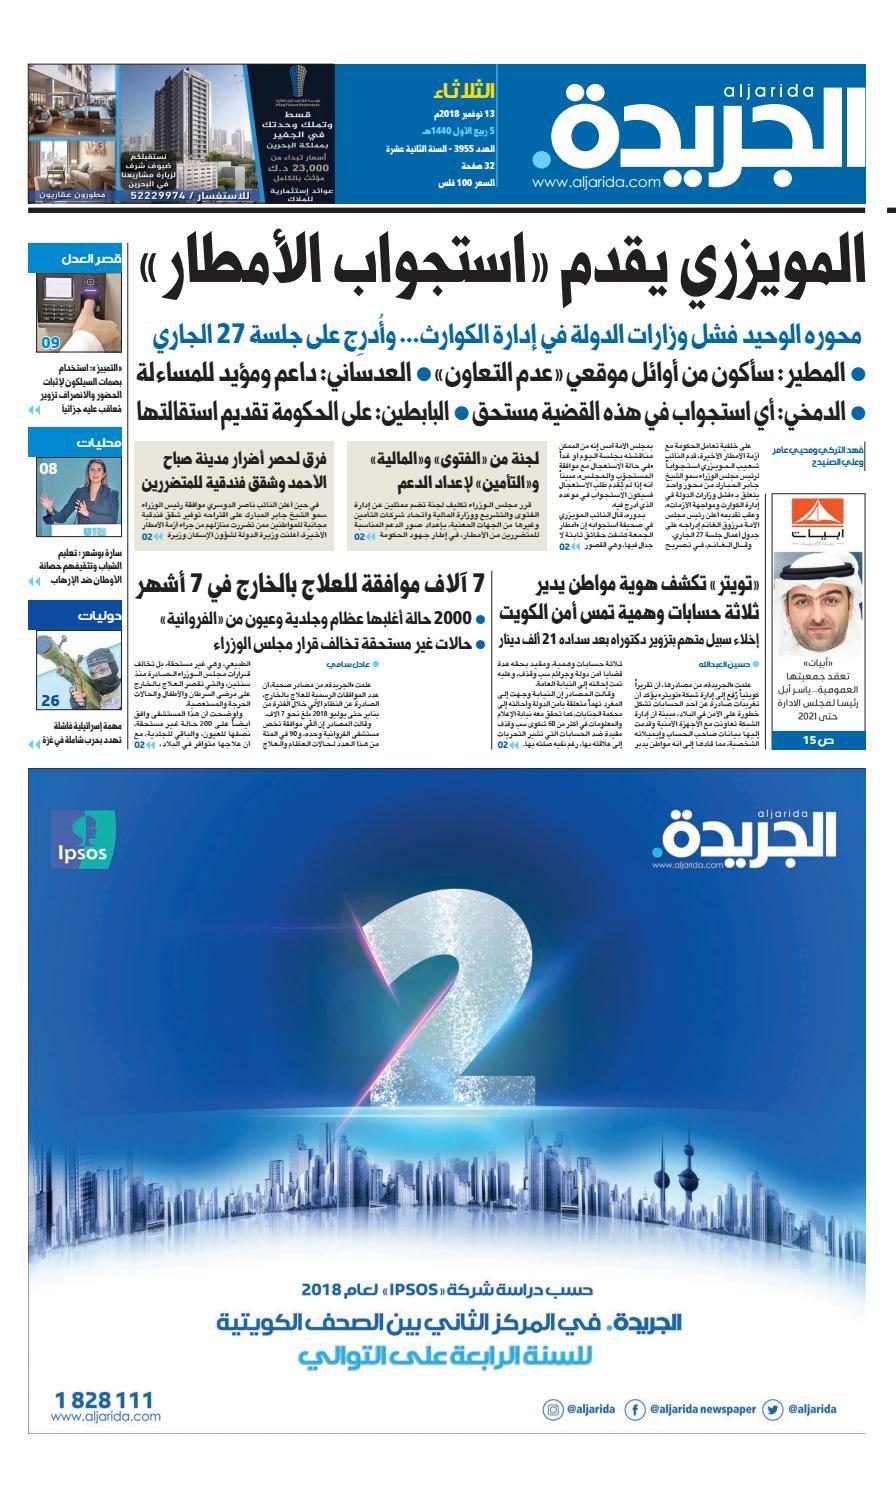 ff4c4ef1bc077 عدد الجريدة الثلاثاء 13 نوفمبر 2018 by Aljarida Newspaper - issuu